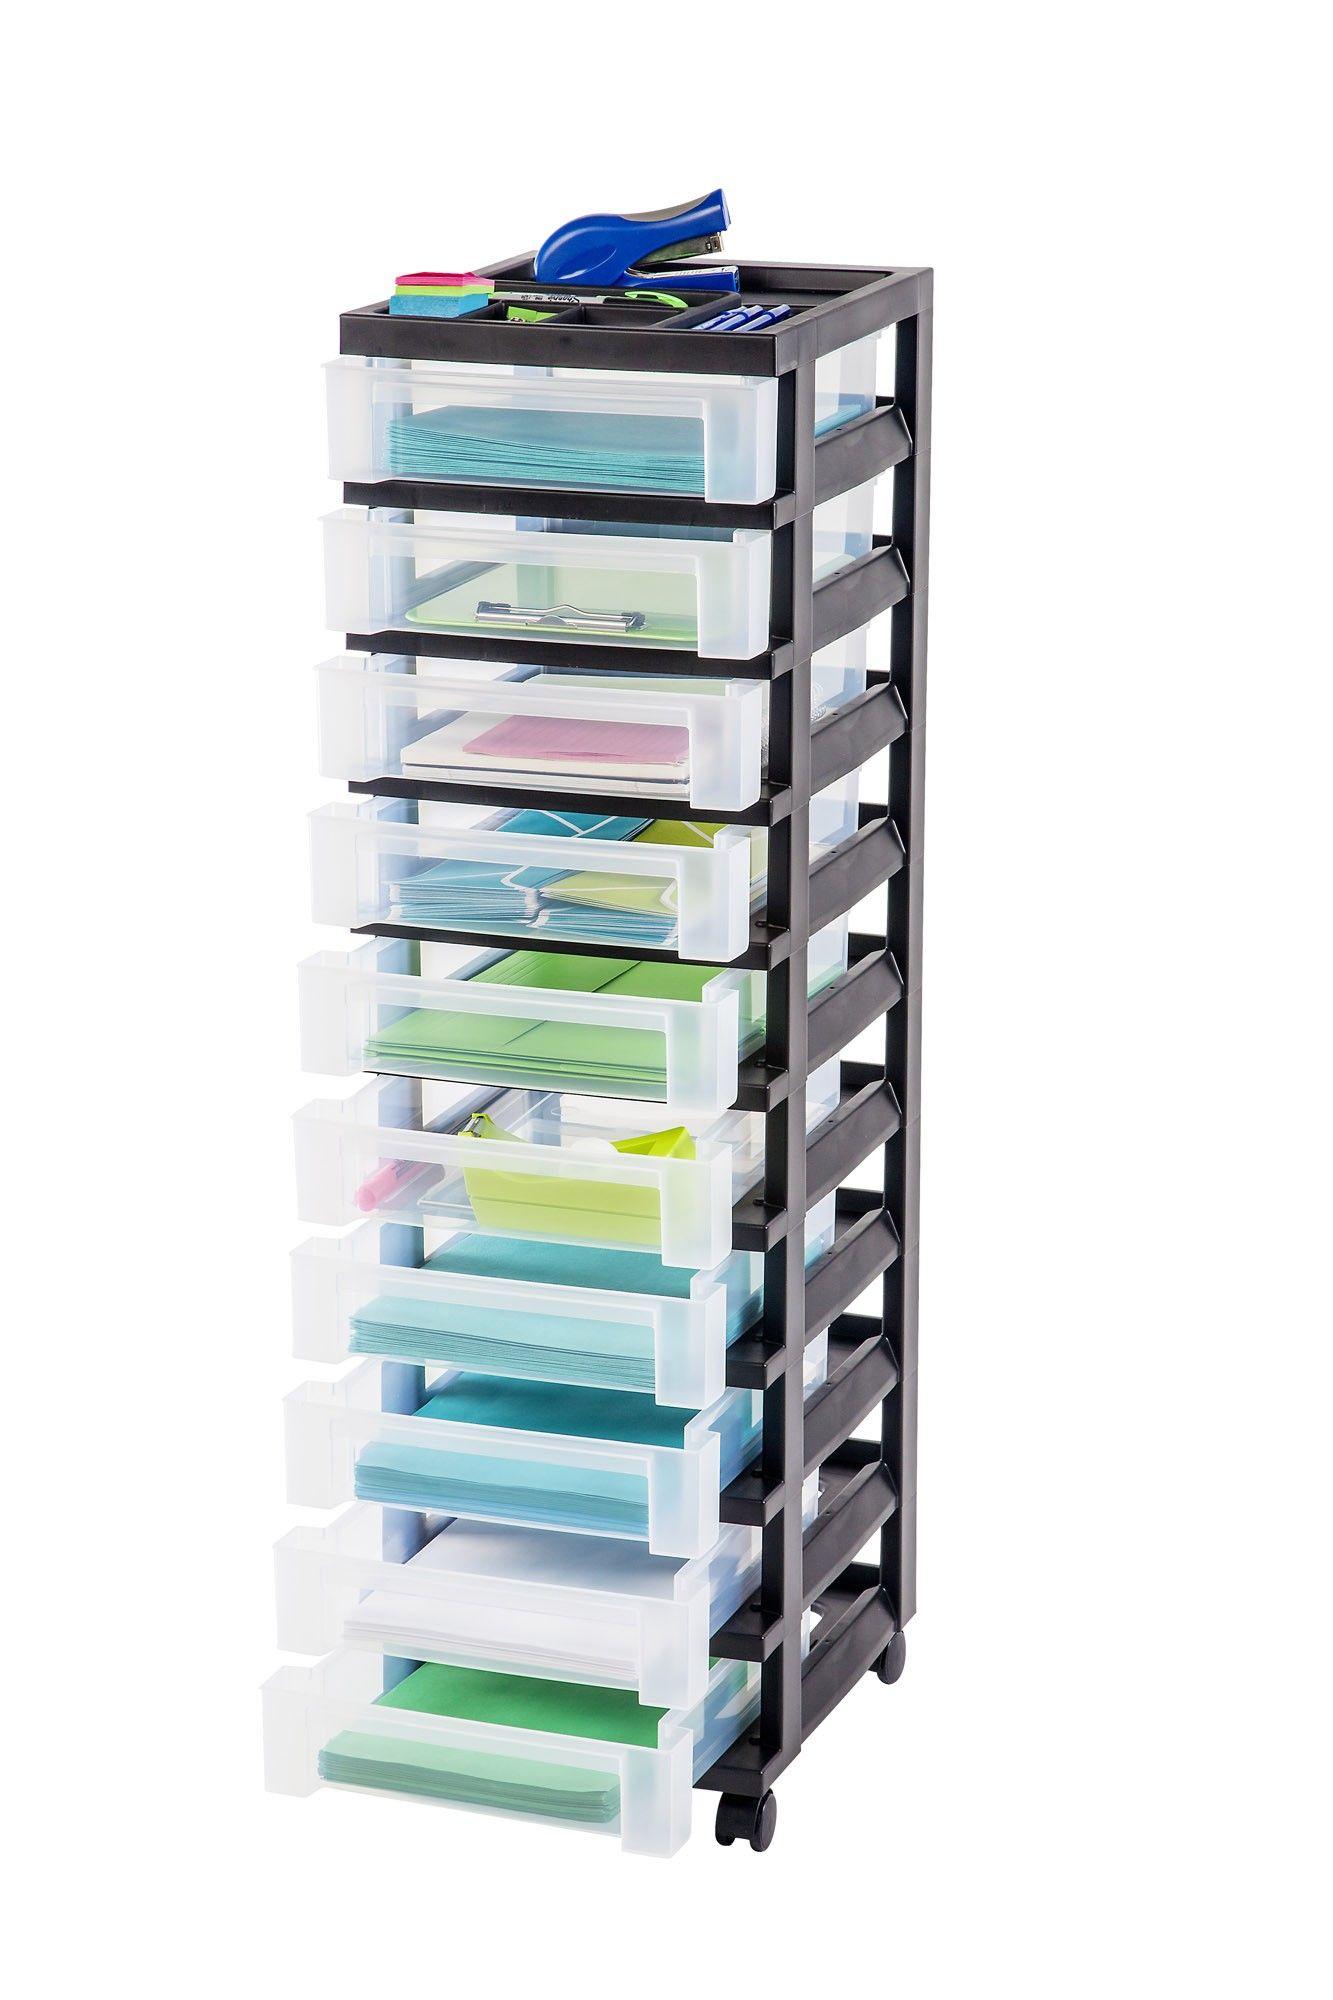 10 Drawer Cart With Organizer Top Plastic Storage Drawers